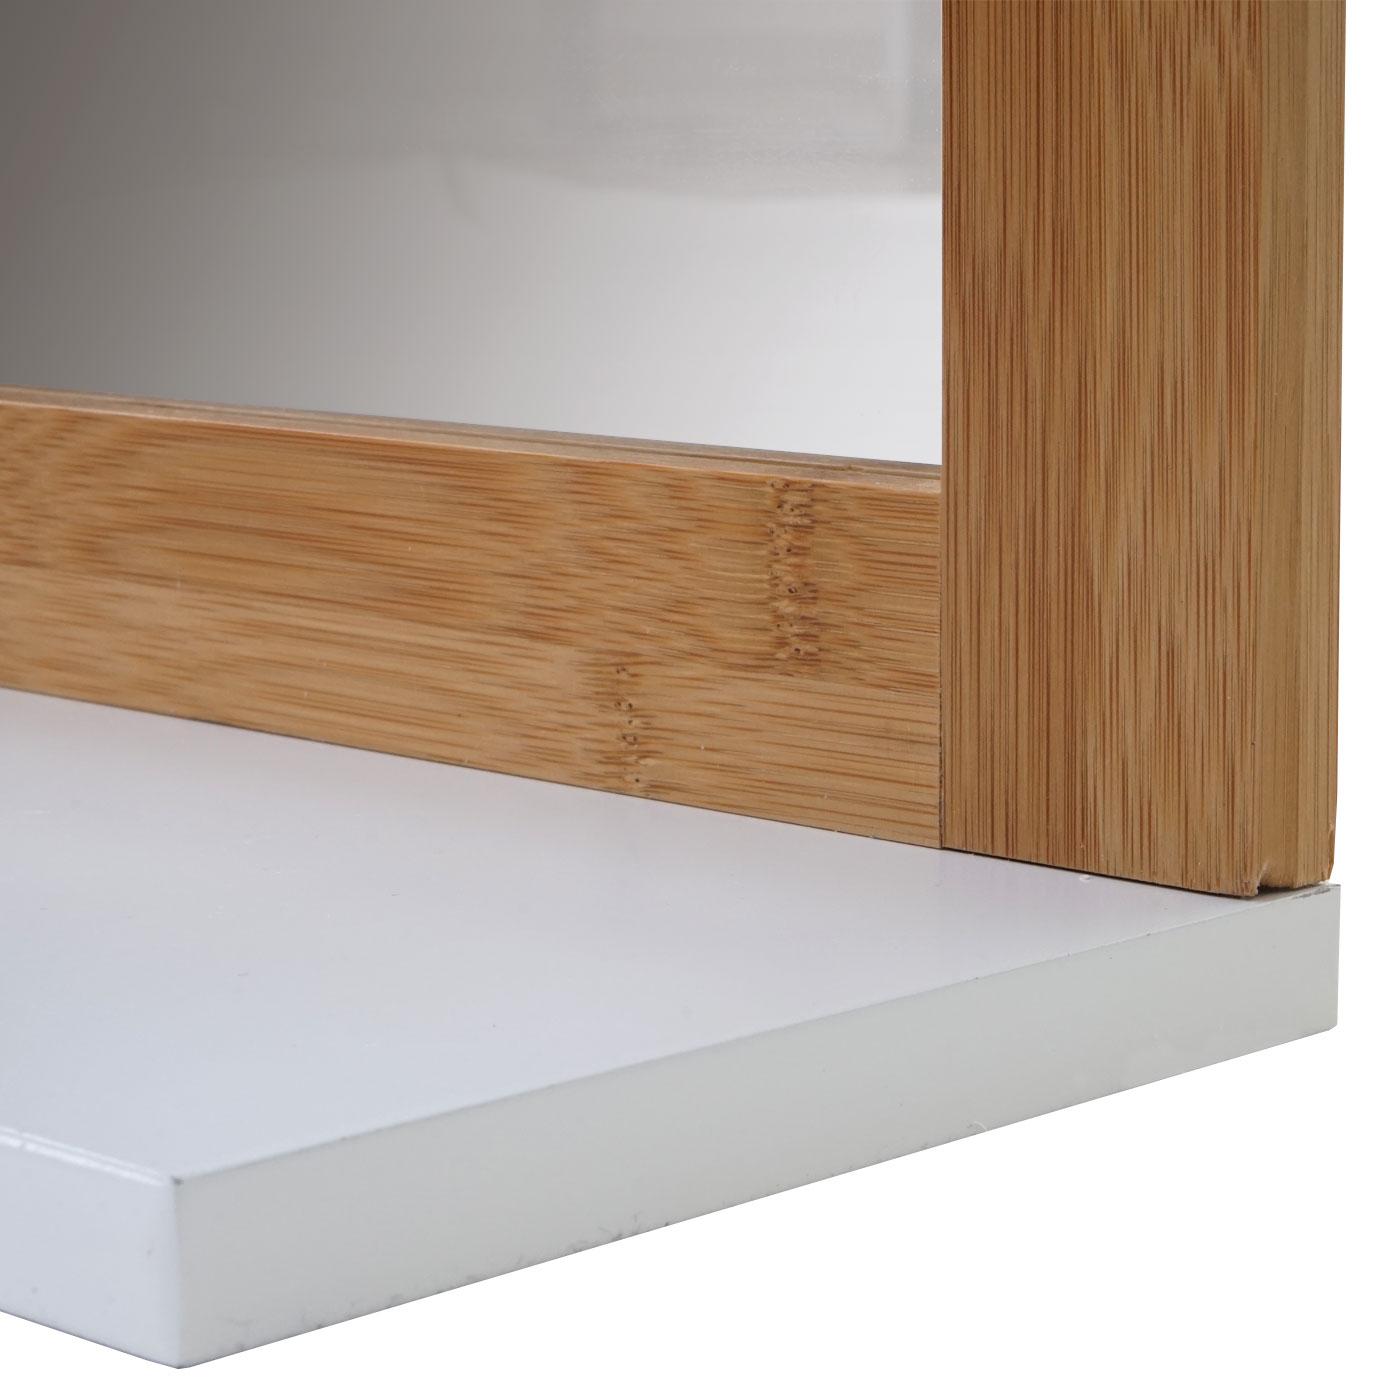 badezimmerset waschbeckenunterschrank wandspiegel hwc a85 bambus wei ebay. Black Bedroom Furniture Sets. Home Design Ideas